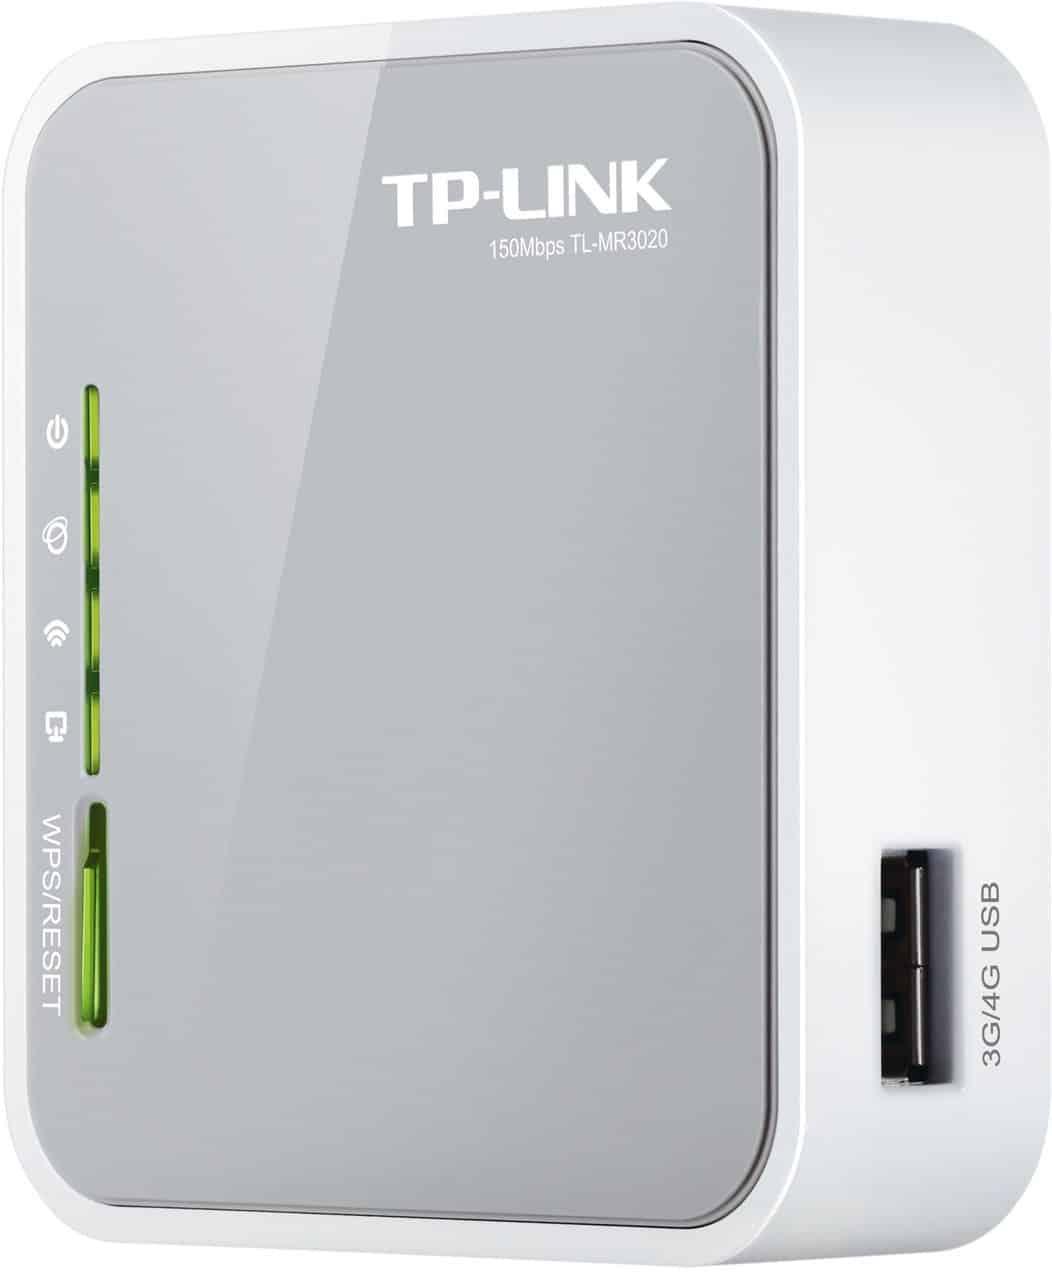 modem-wifi-3g-tplink